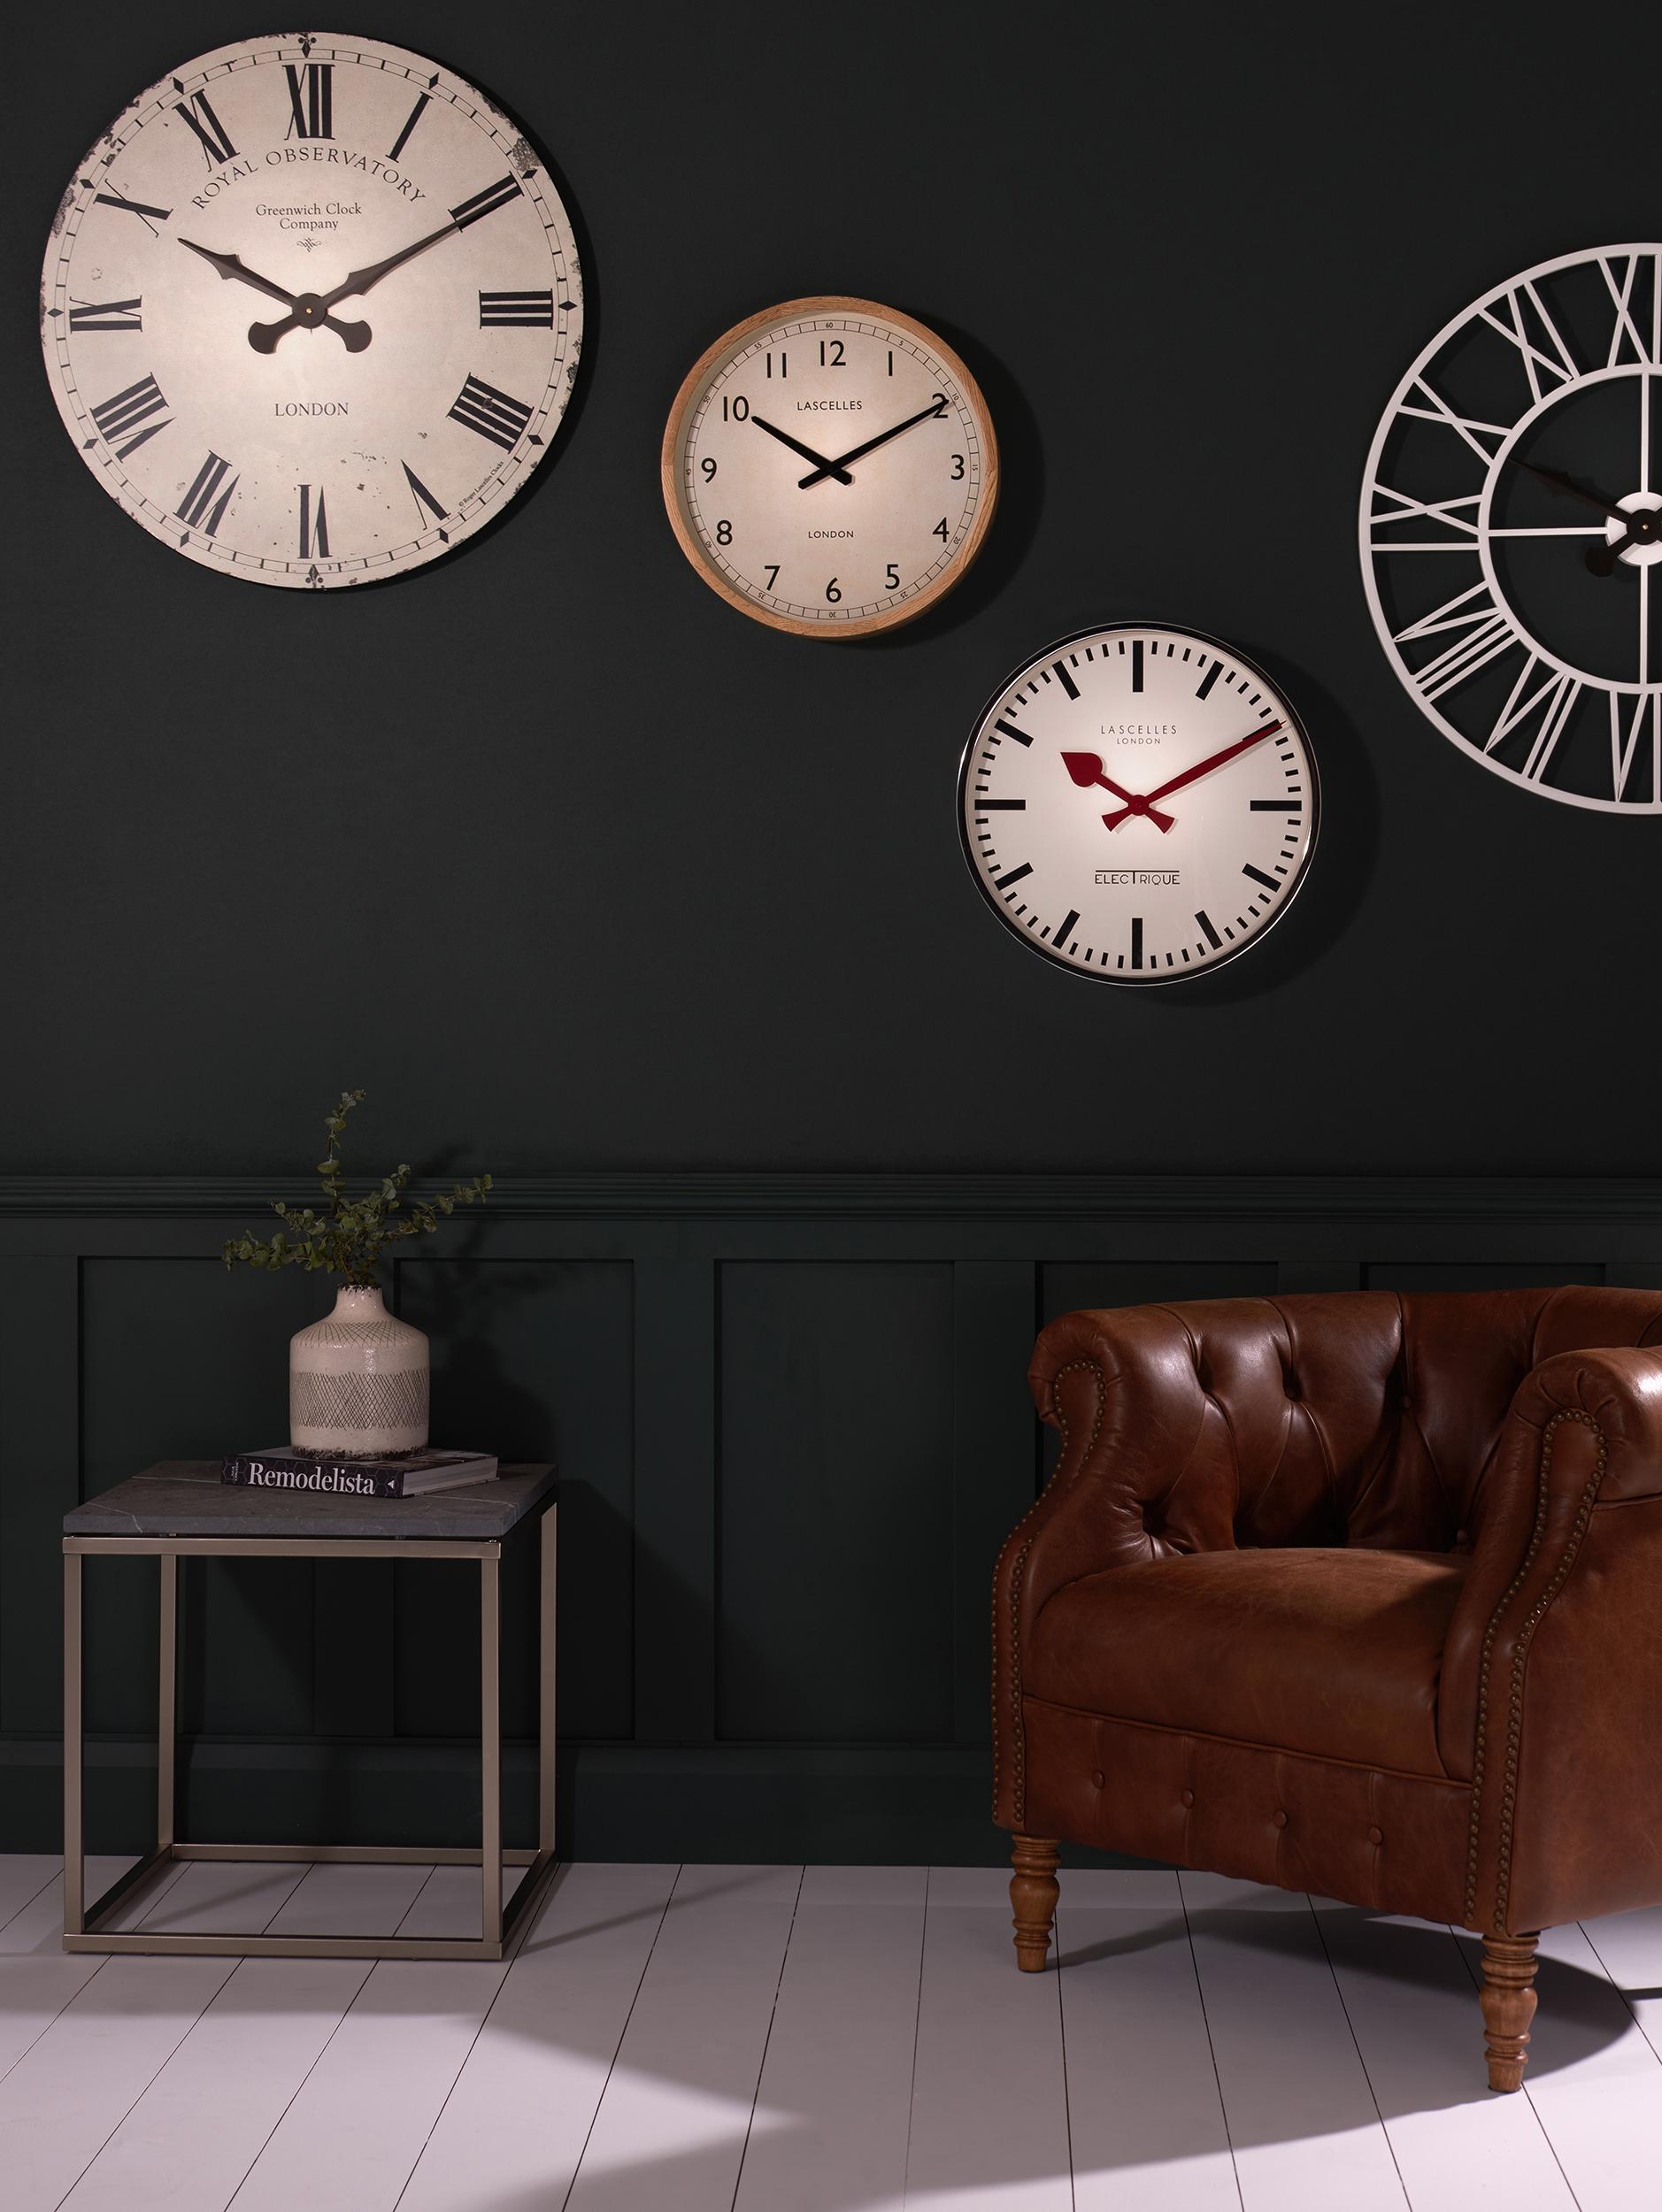 icon-artist-management-nu-valado-commissions-furniture-village-2018-001.jpg